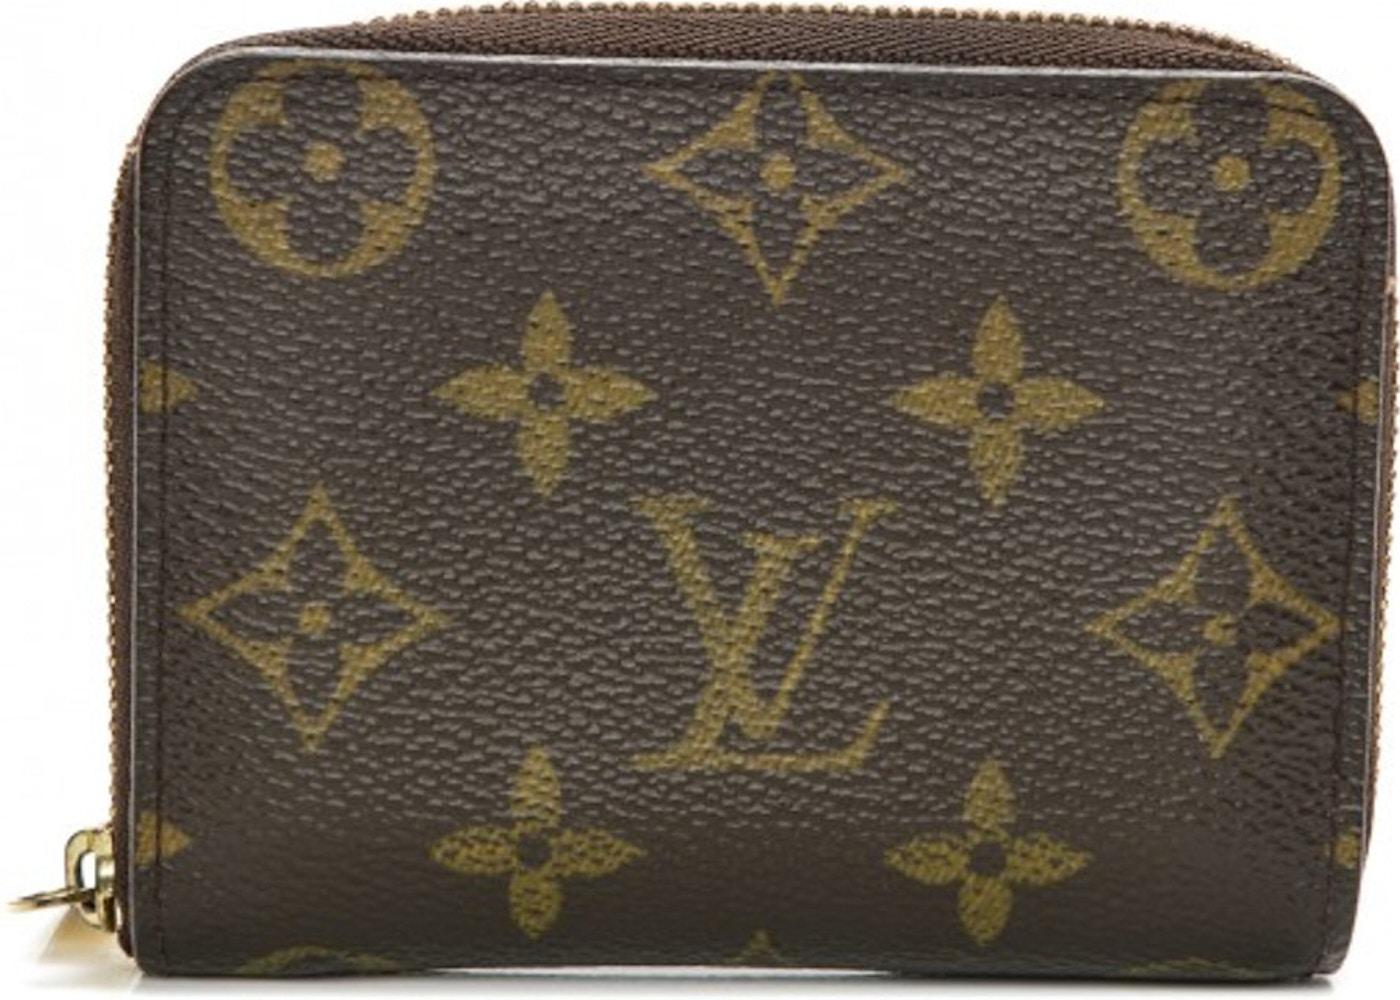 ab8ec4f56f77 Louis Vuitton Wallet Zippy Coin Purse Monogram Brown. Monogram Brown